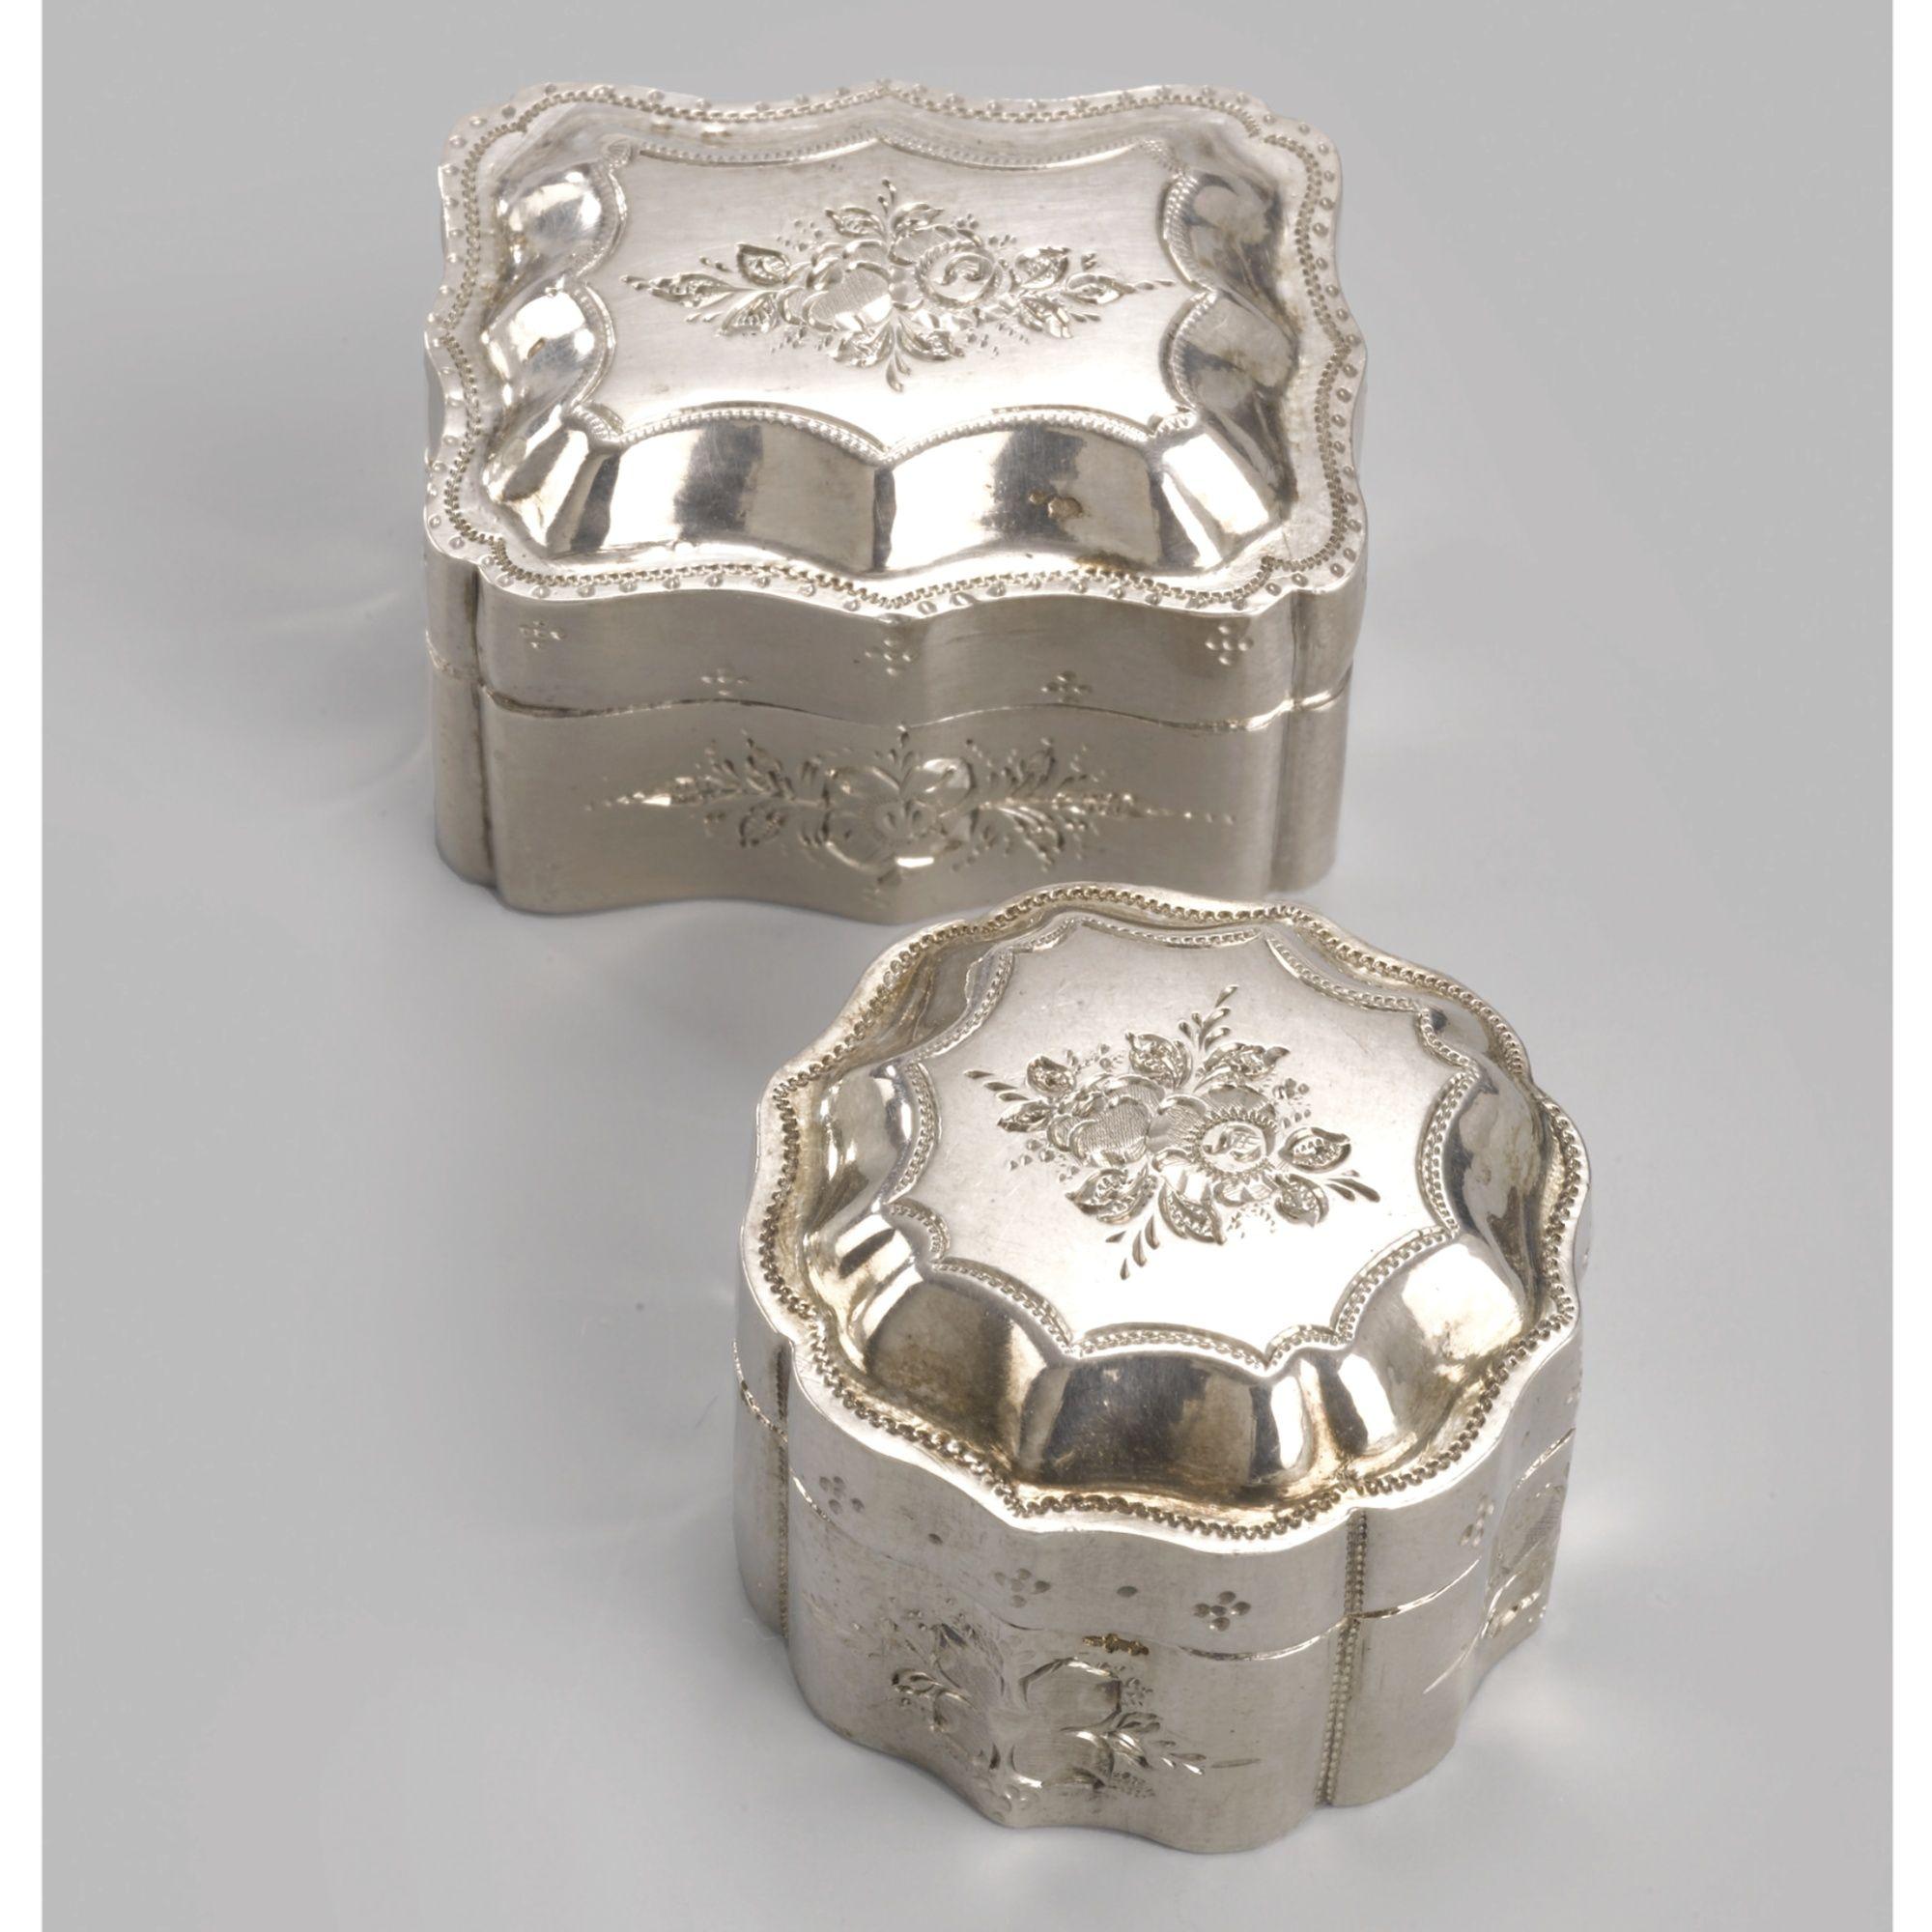 A PAIR OF DUTCH SILVER MINIATURE BISCUIT BOXES, GERRIT GREUP, SCHOONHOVEN, 1864-1888